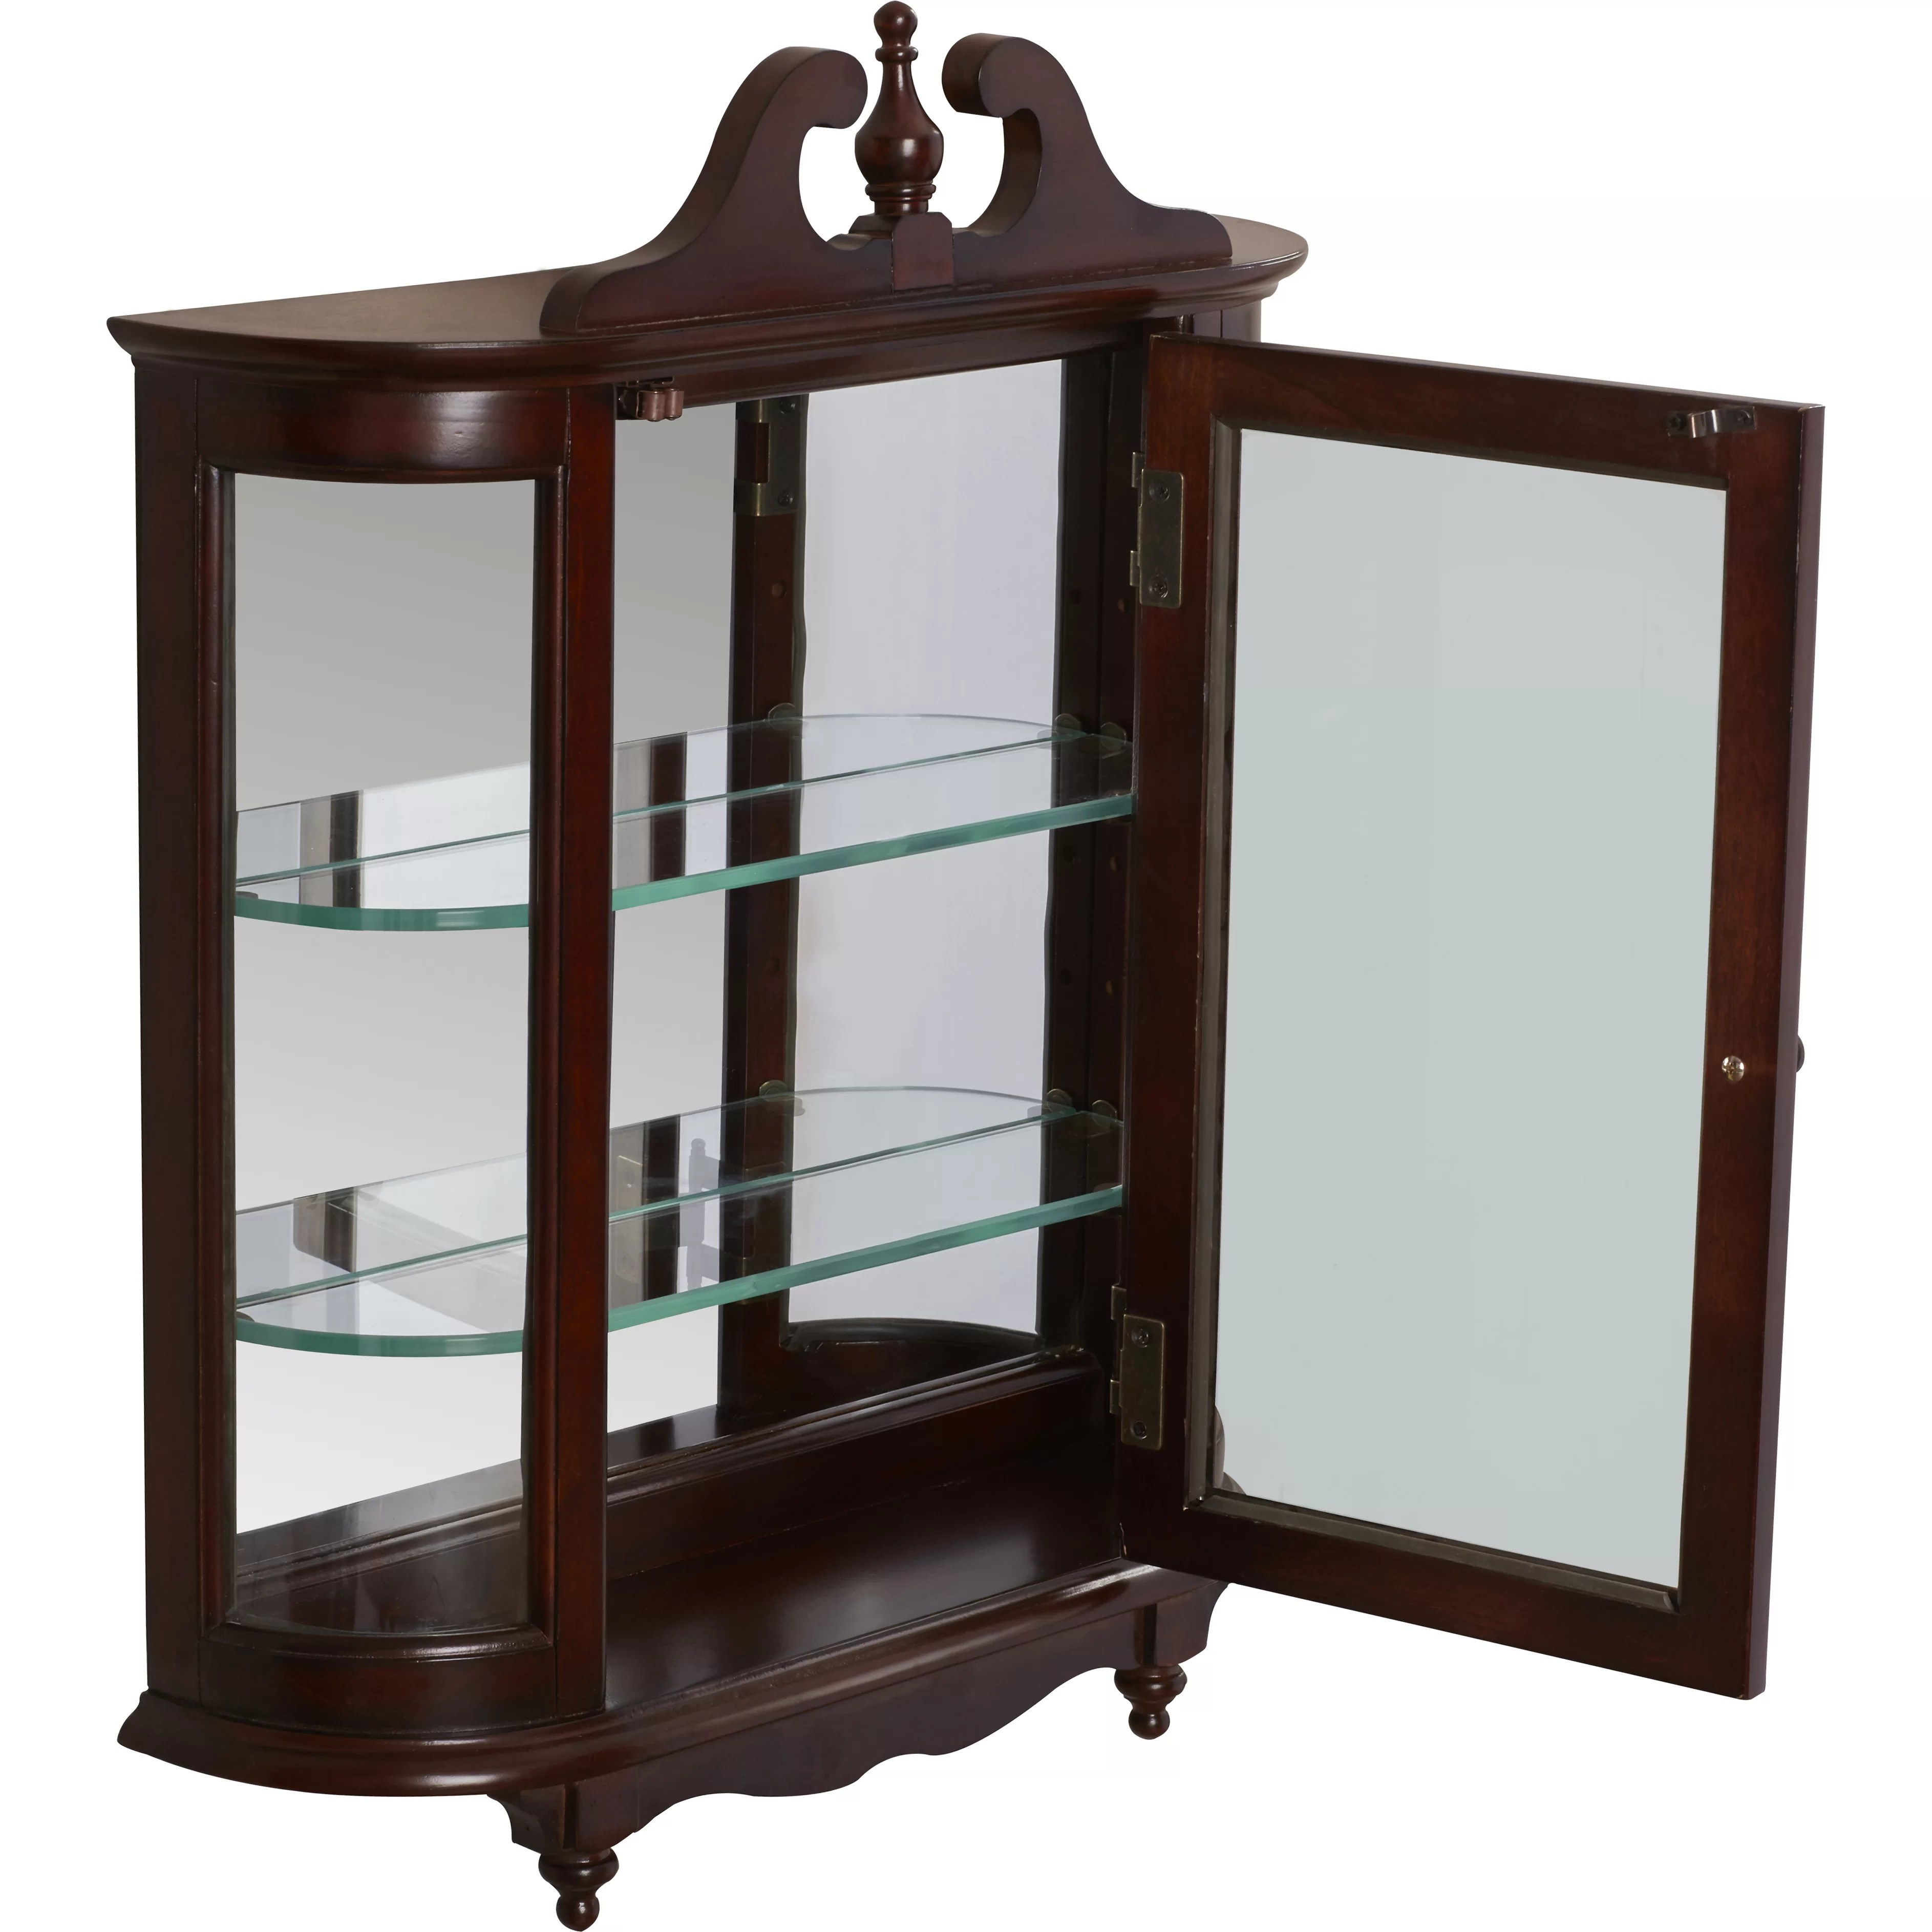 Rosalind Wheeler Cheshire WallMounted Curio Cabinet